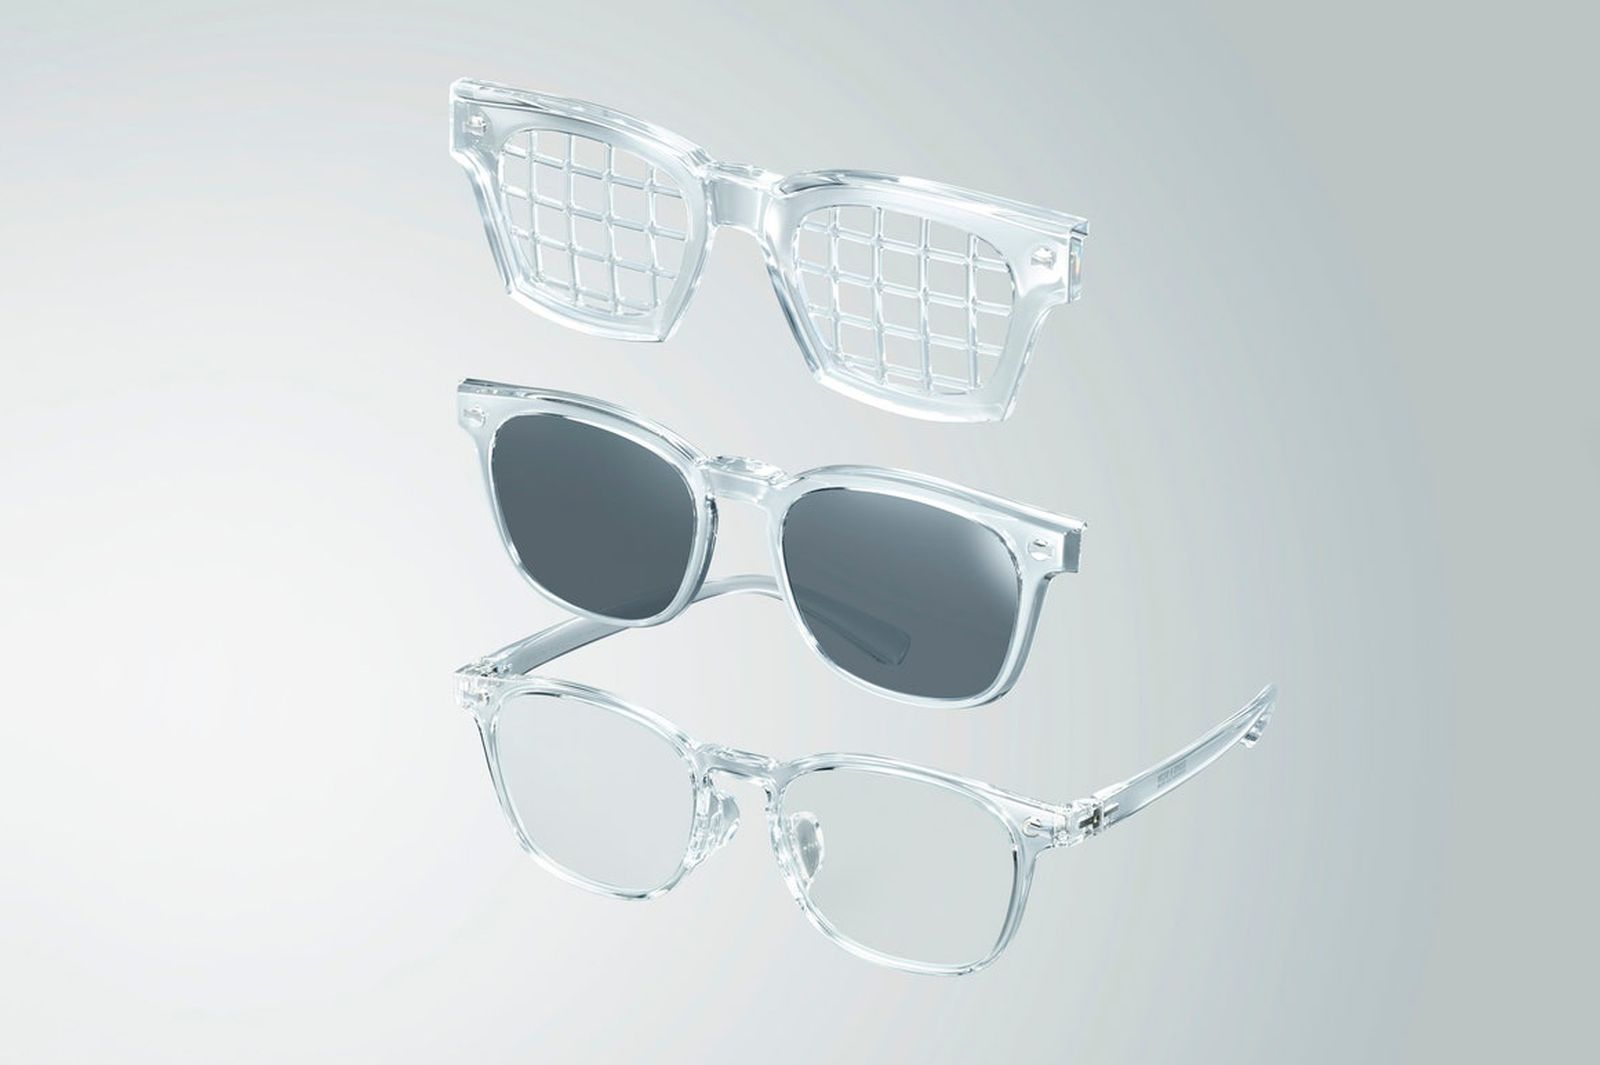 verdy-jins-sun-nigo-glasses-collab- (5)